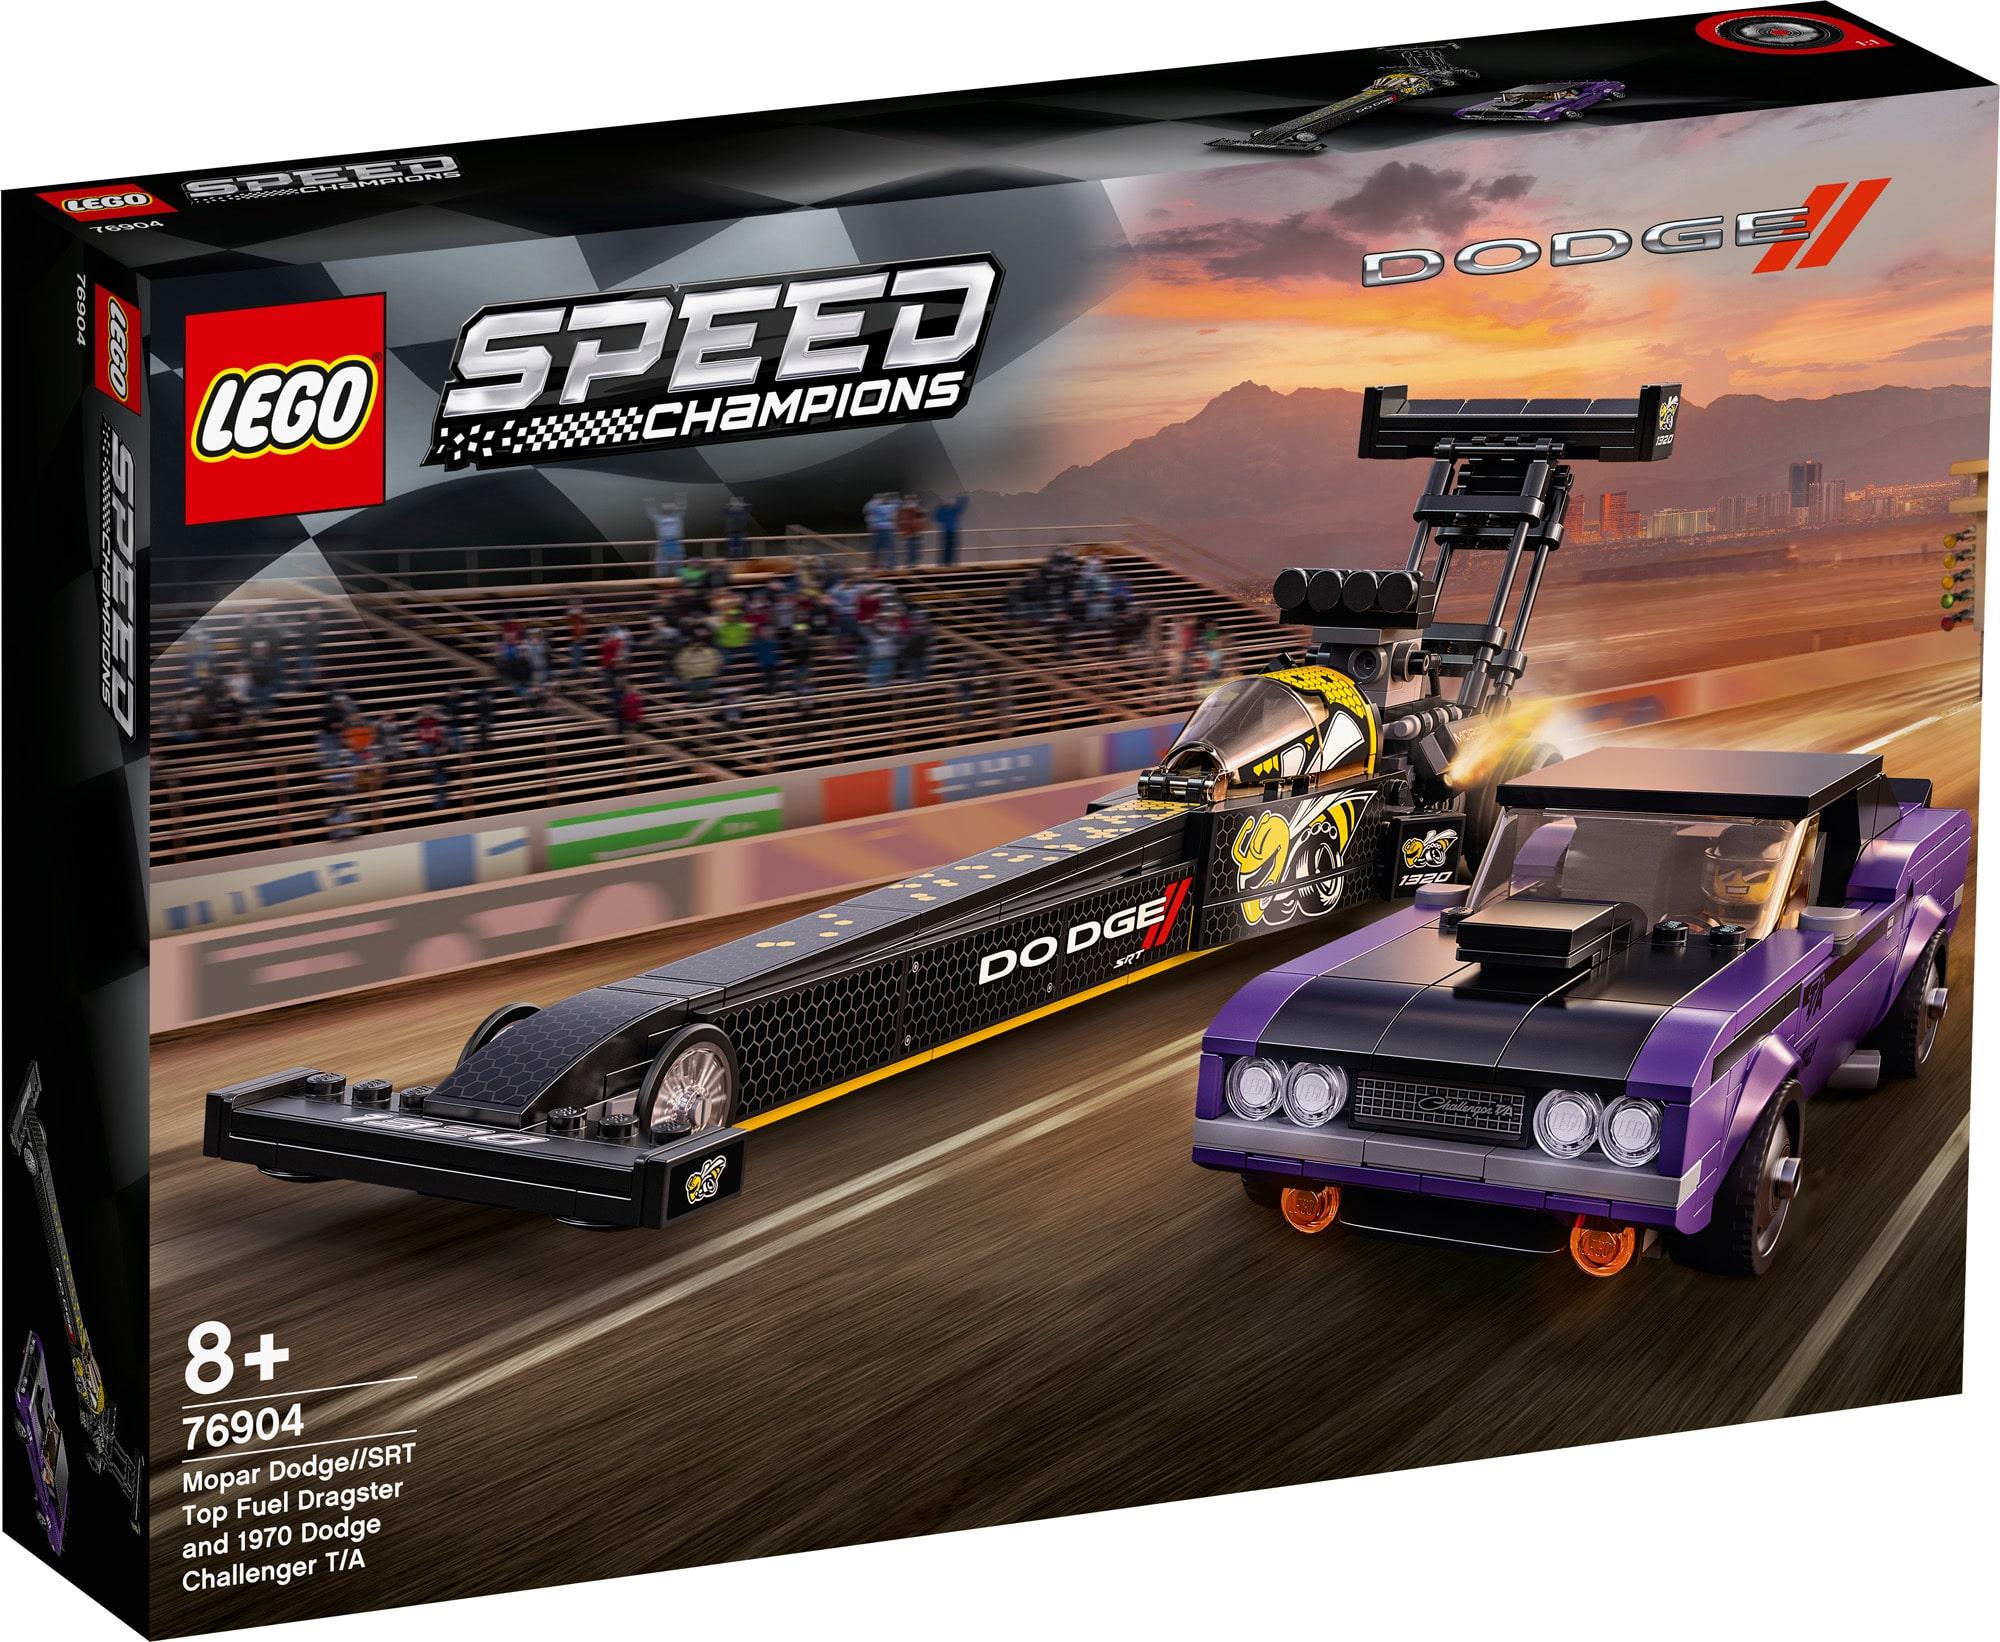 LEGO Speed Champions 76904 Dodge 1